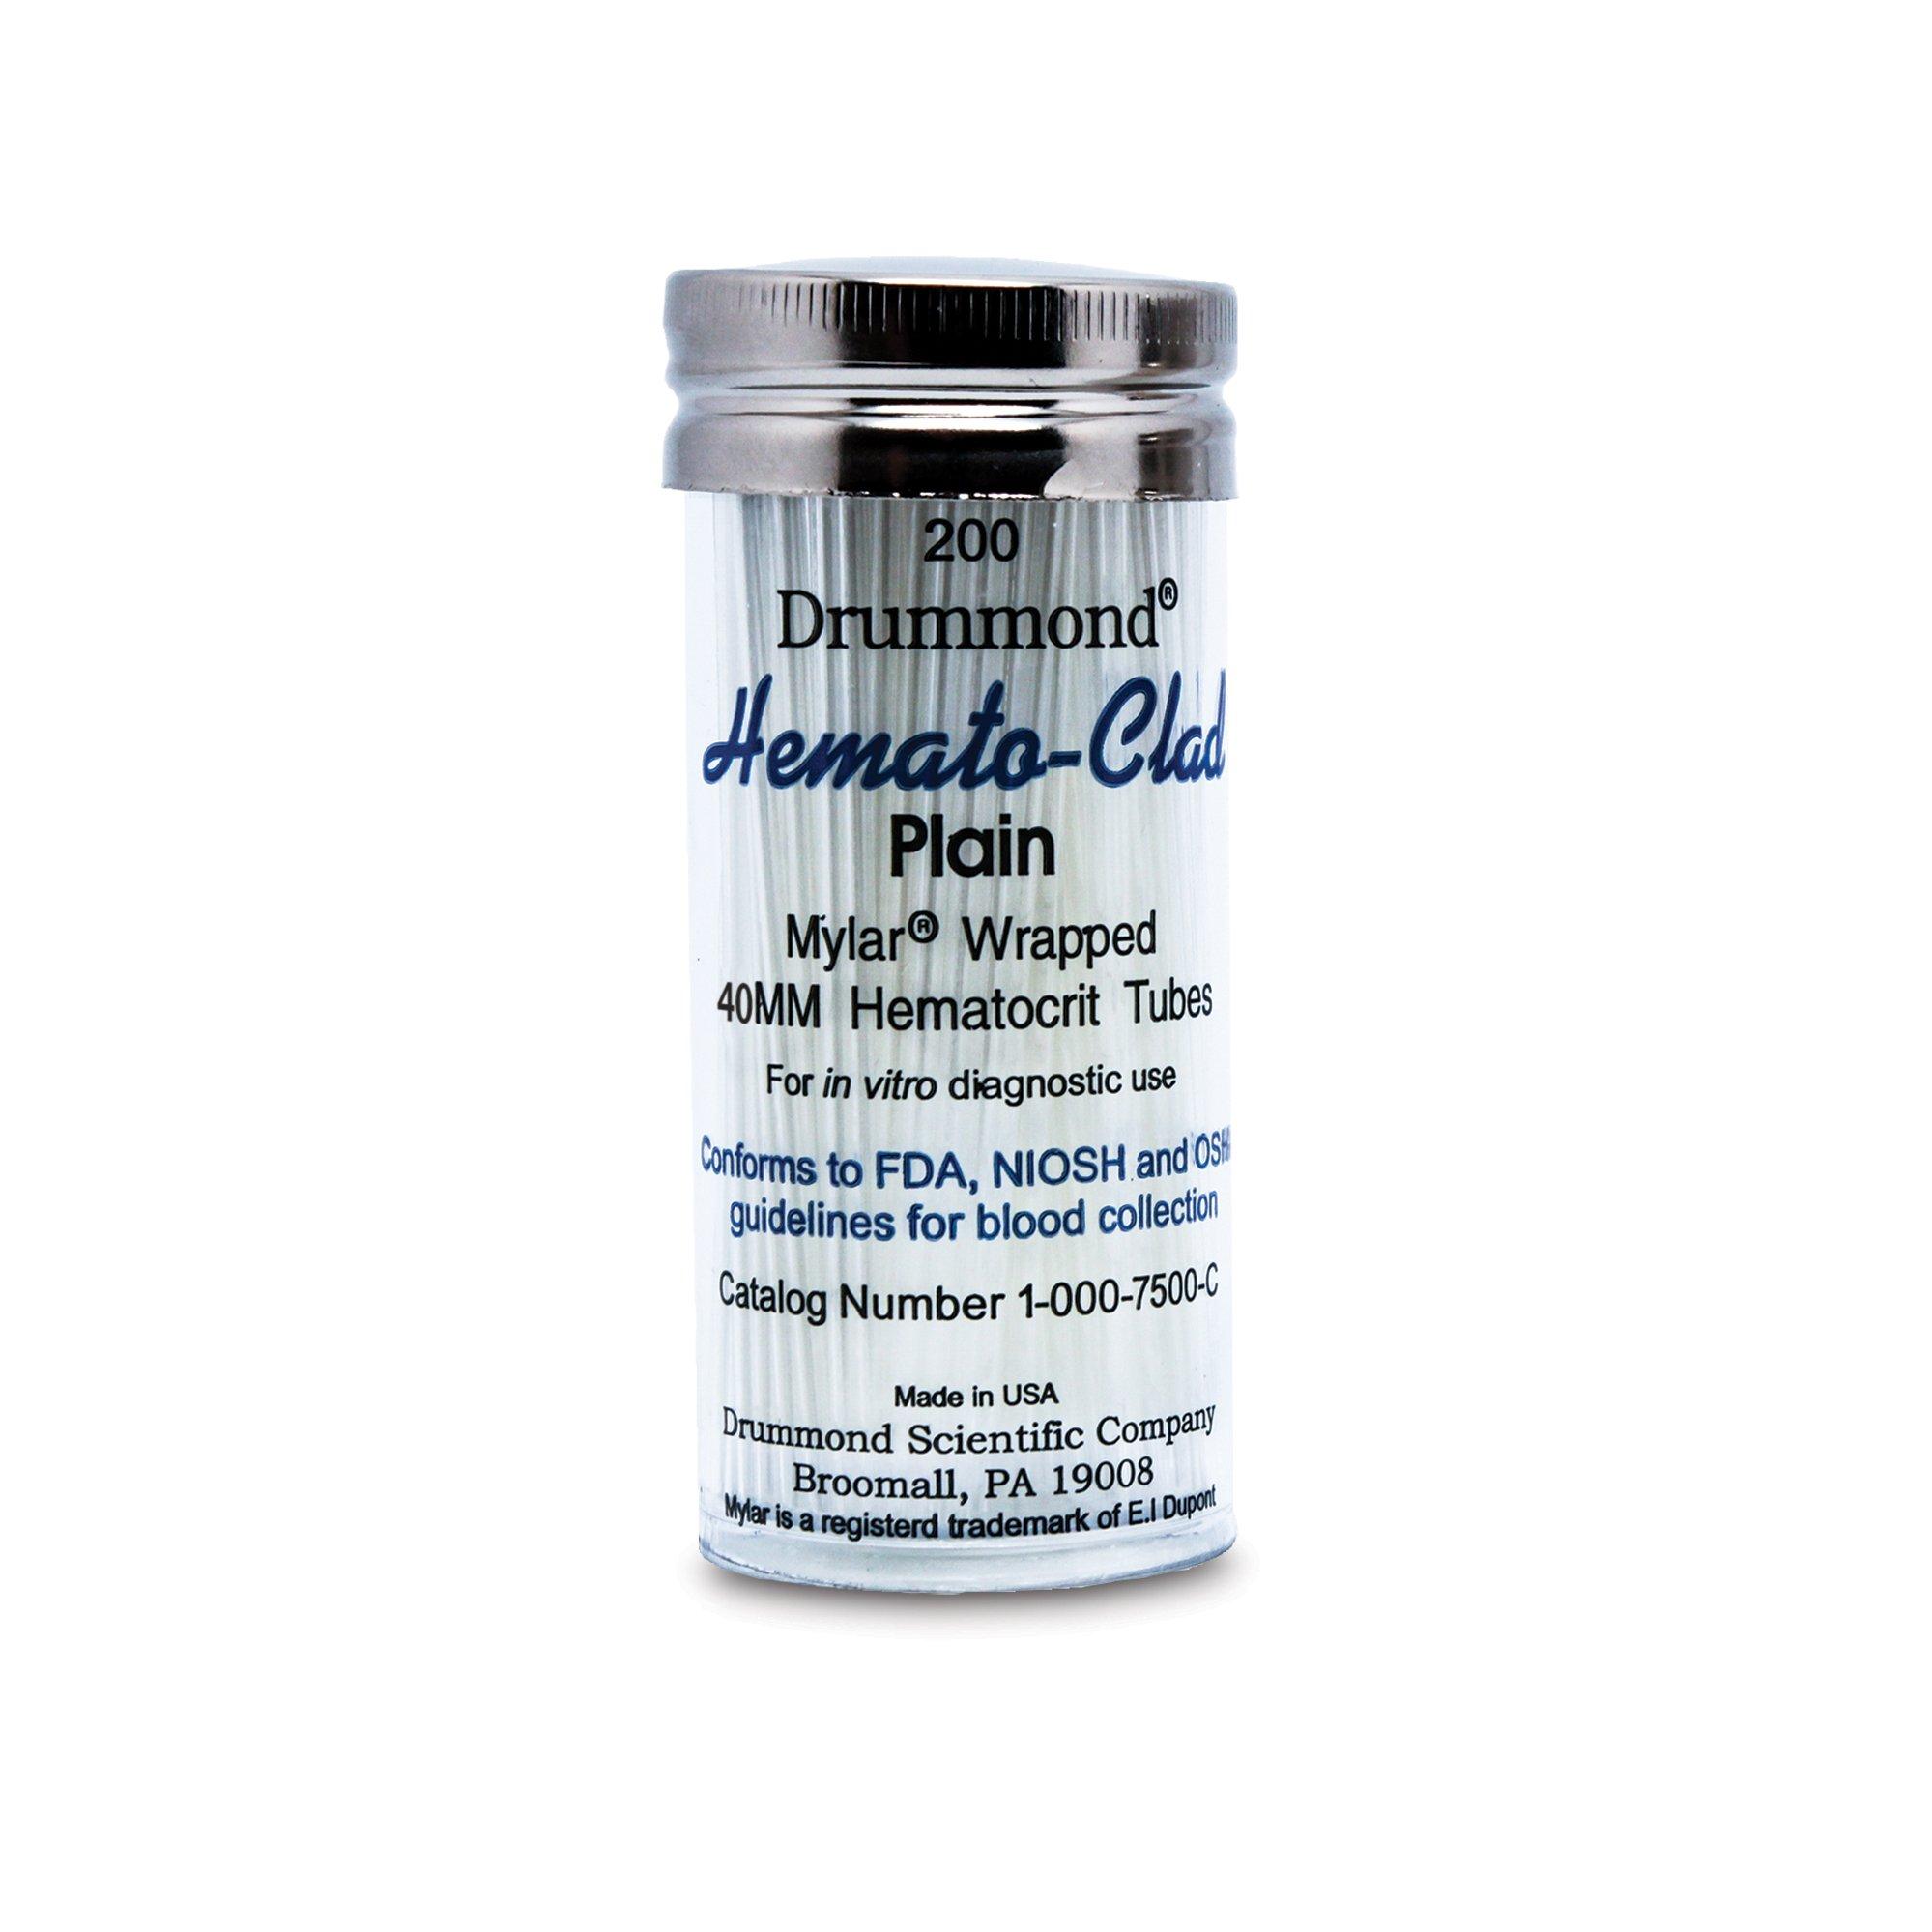 Plain Glass 40mm Hematocrit Tubes